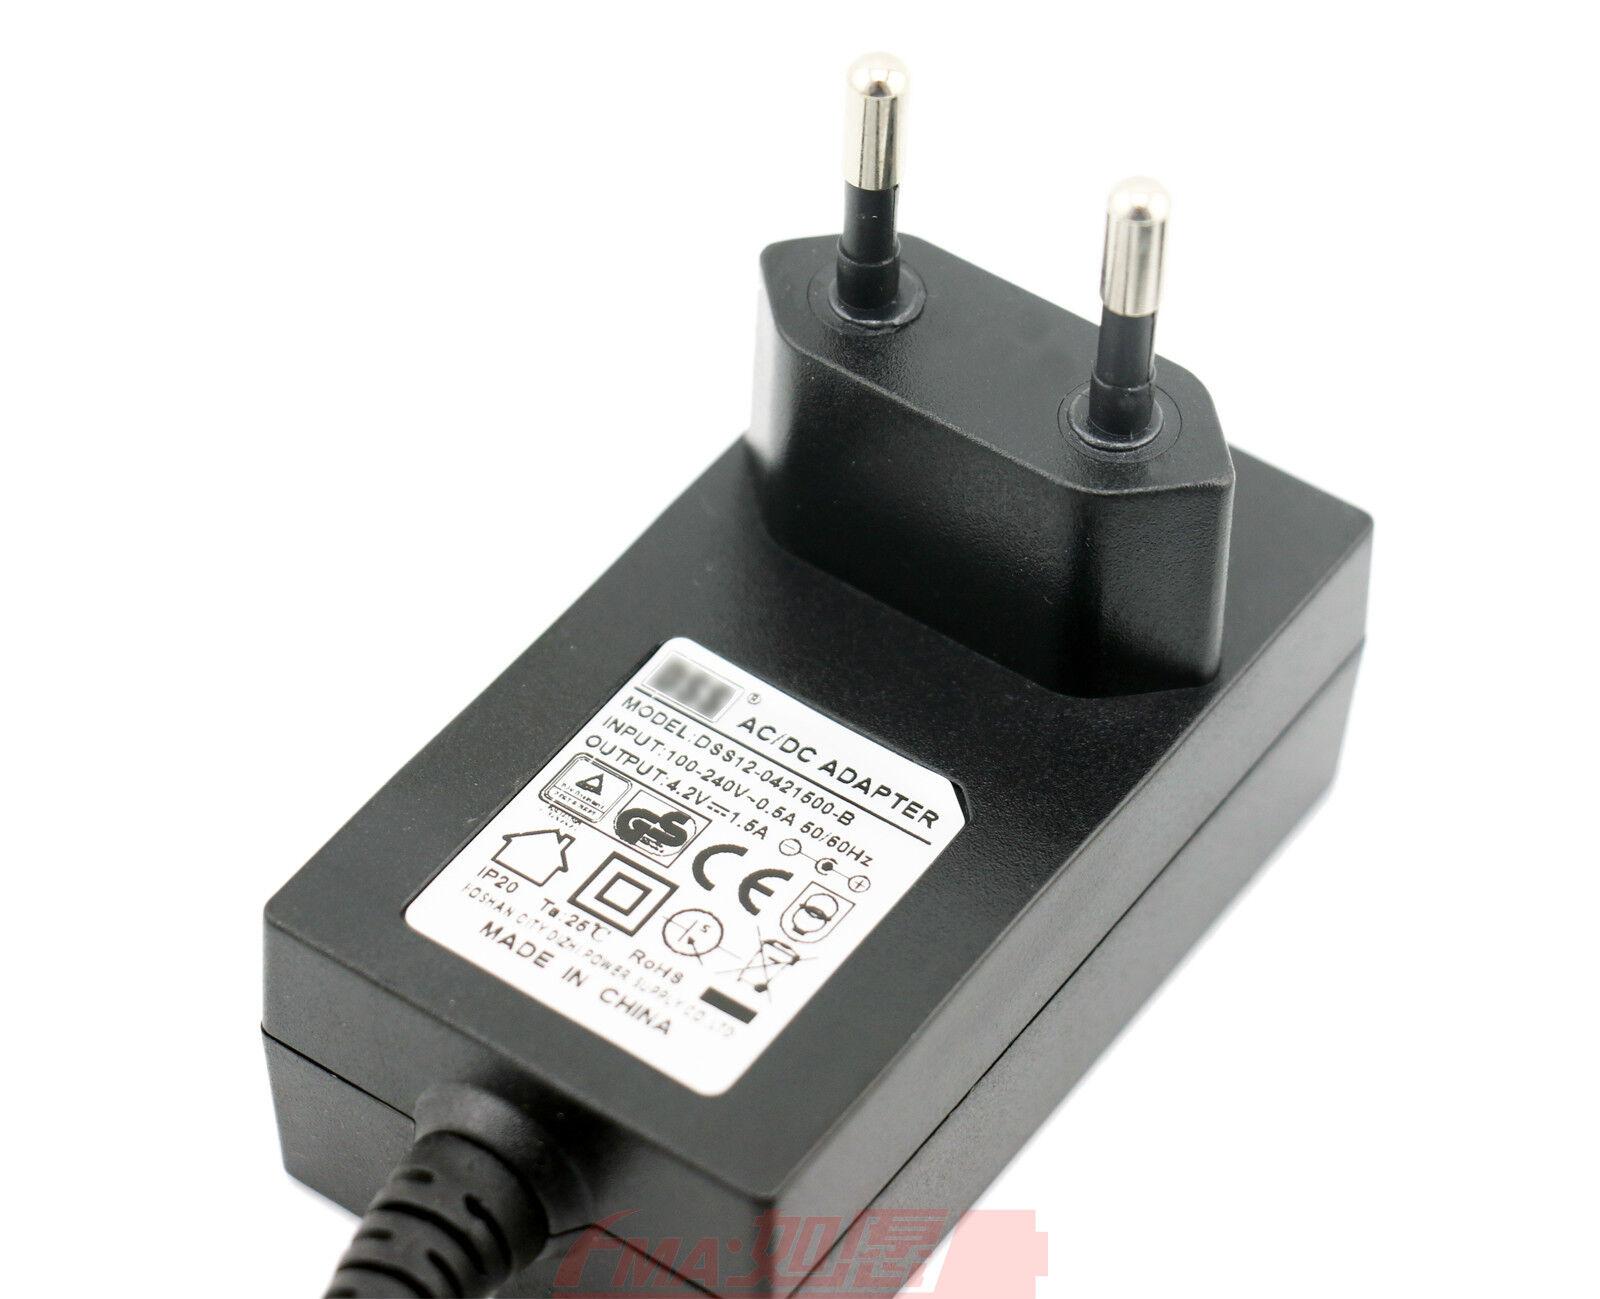 100Pcs 3.7V Li-ion/LiPo Battery 4.2V Charger 1.5A Intelligent/Smart Control EUF